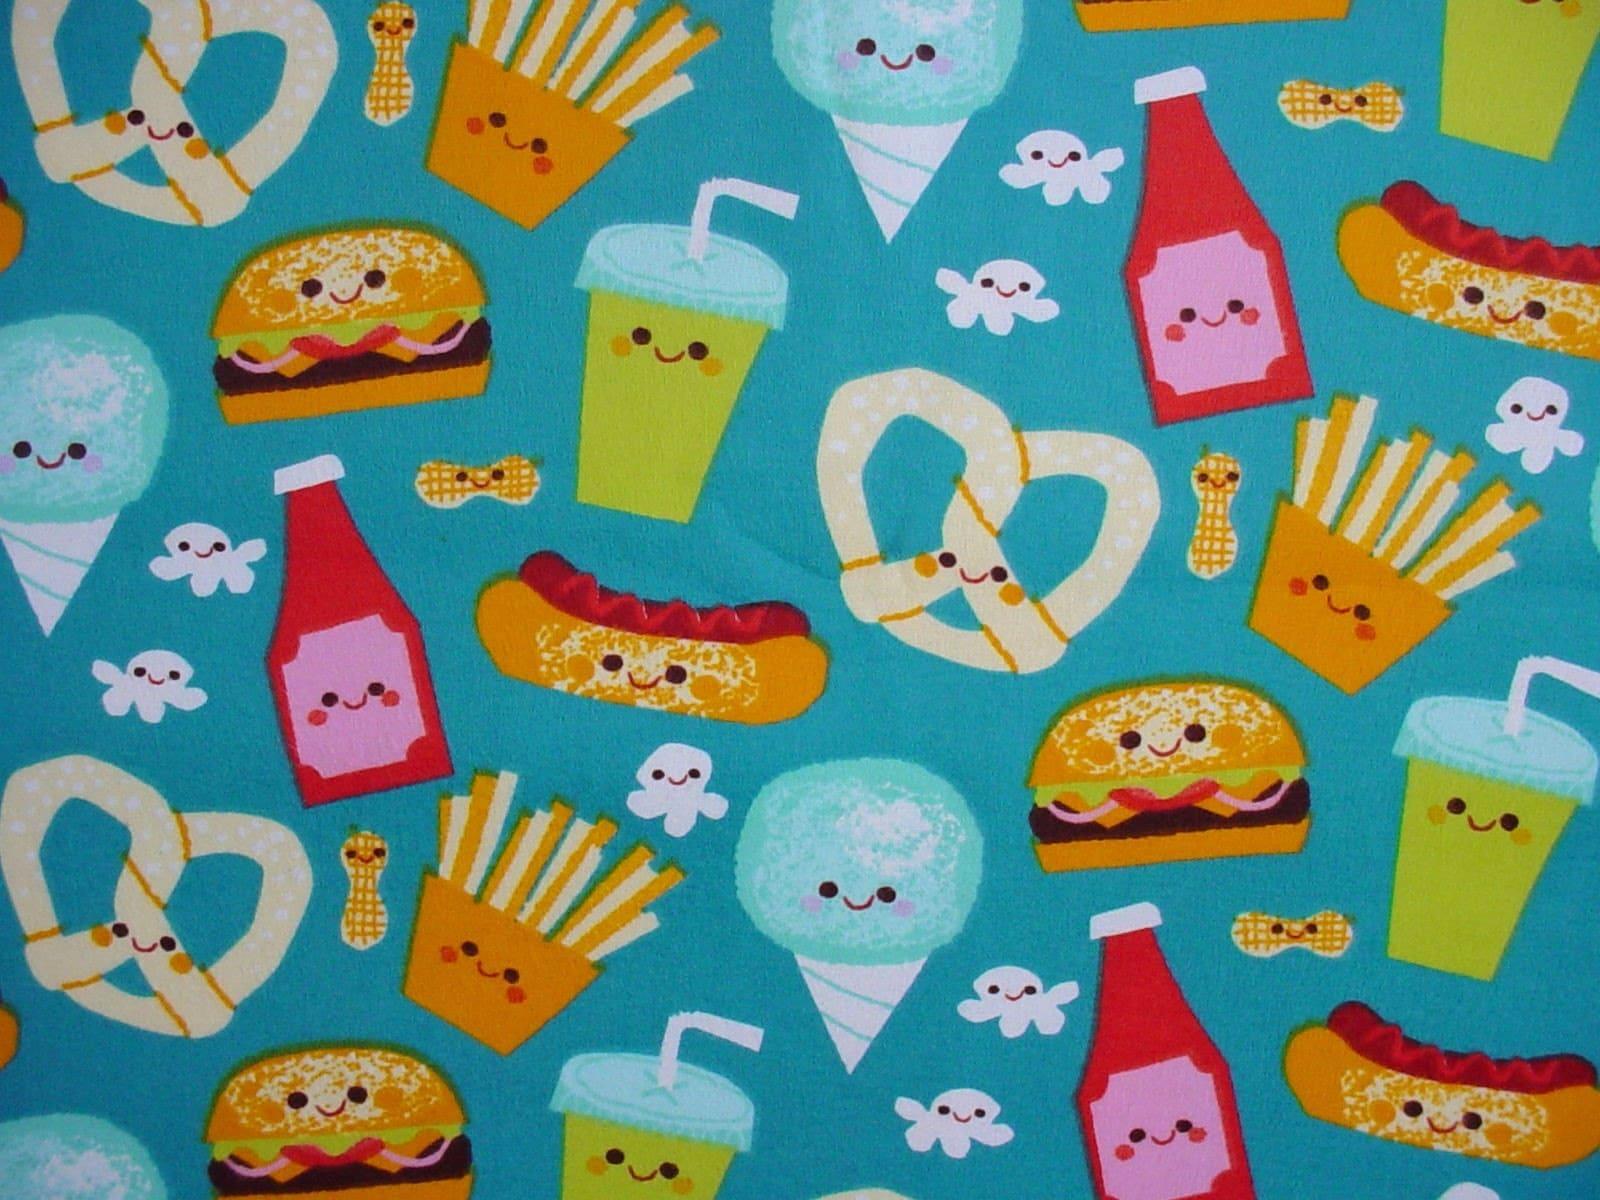 junk food cute cotton flannel fabric kawaii htf. Black Bedroom Furniture Sets. Home Design Ideas